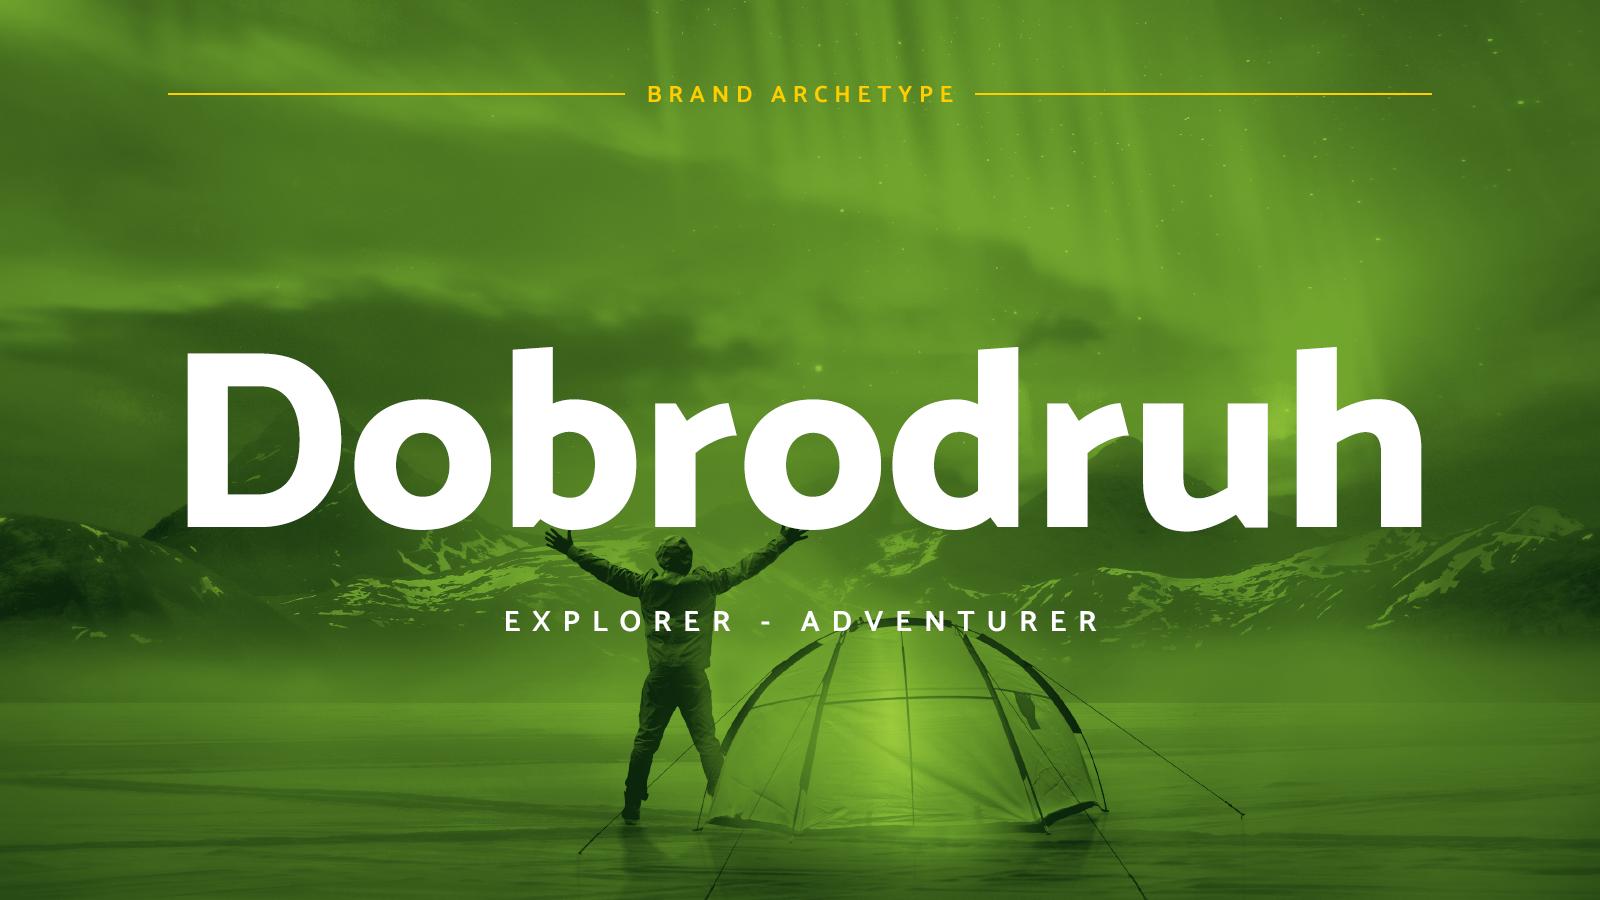 Brand archetypy: Prieskumník (Explorer - Adventurer)